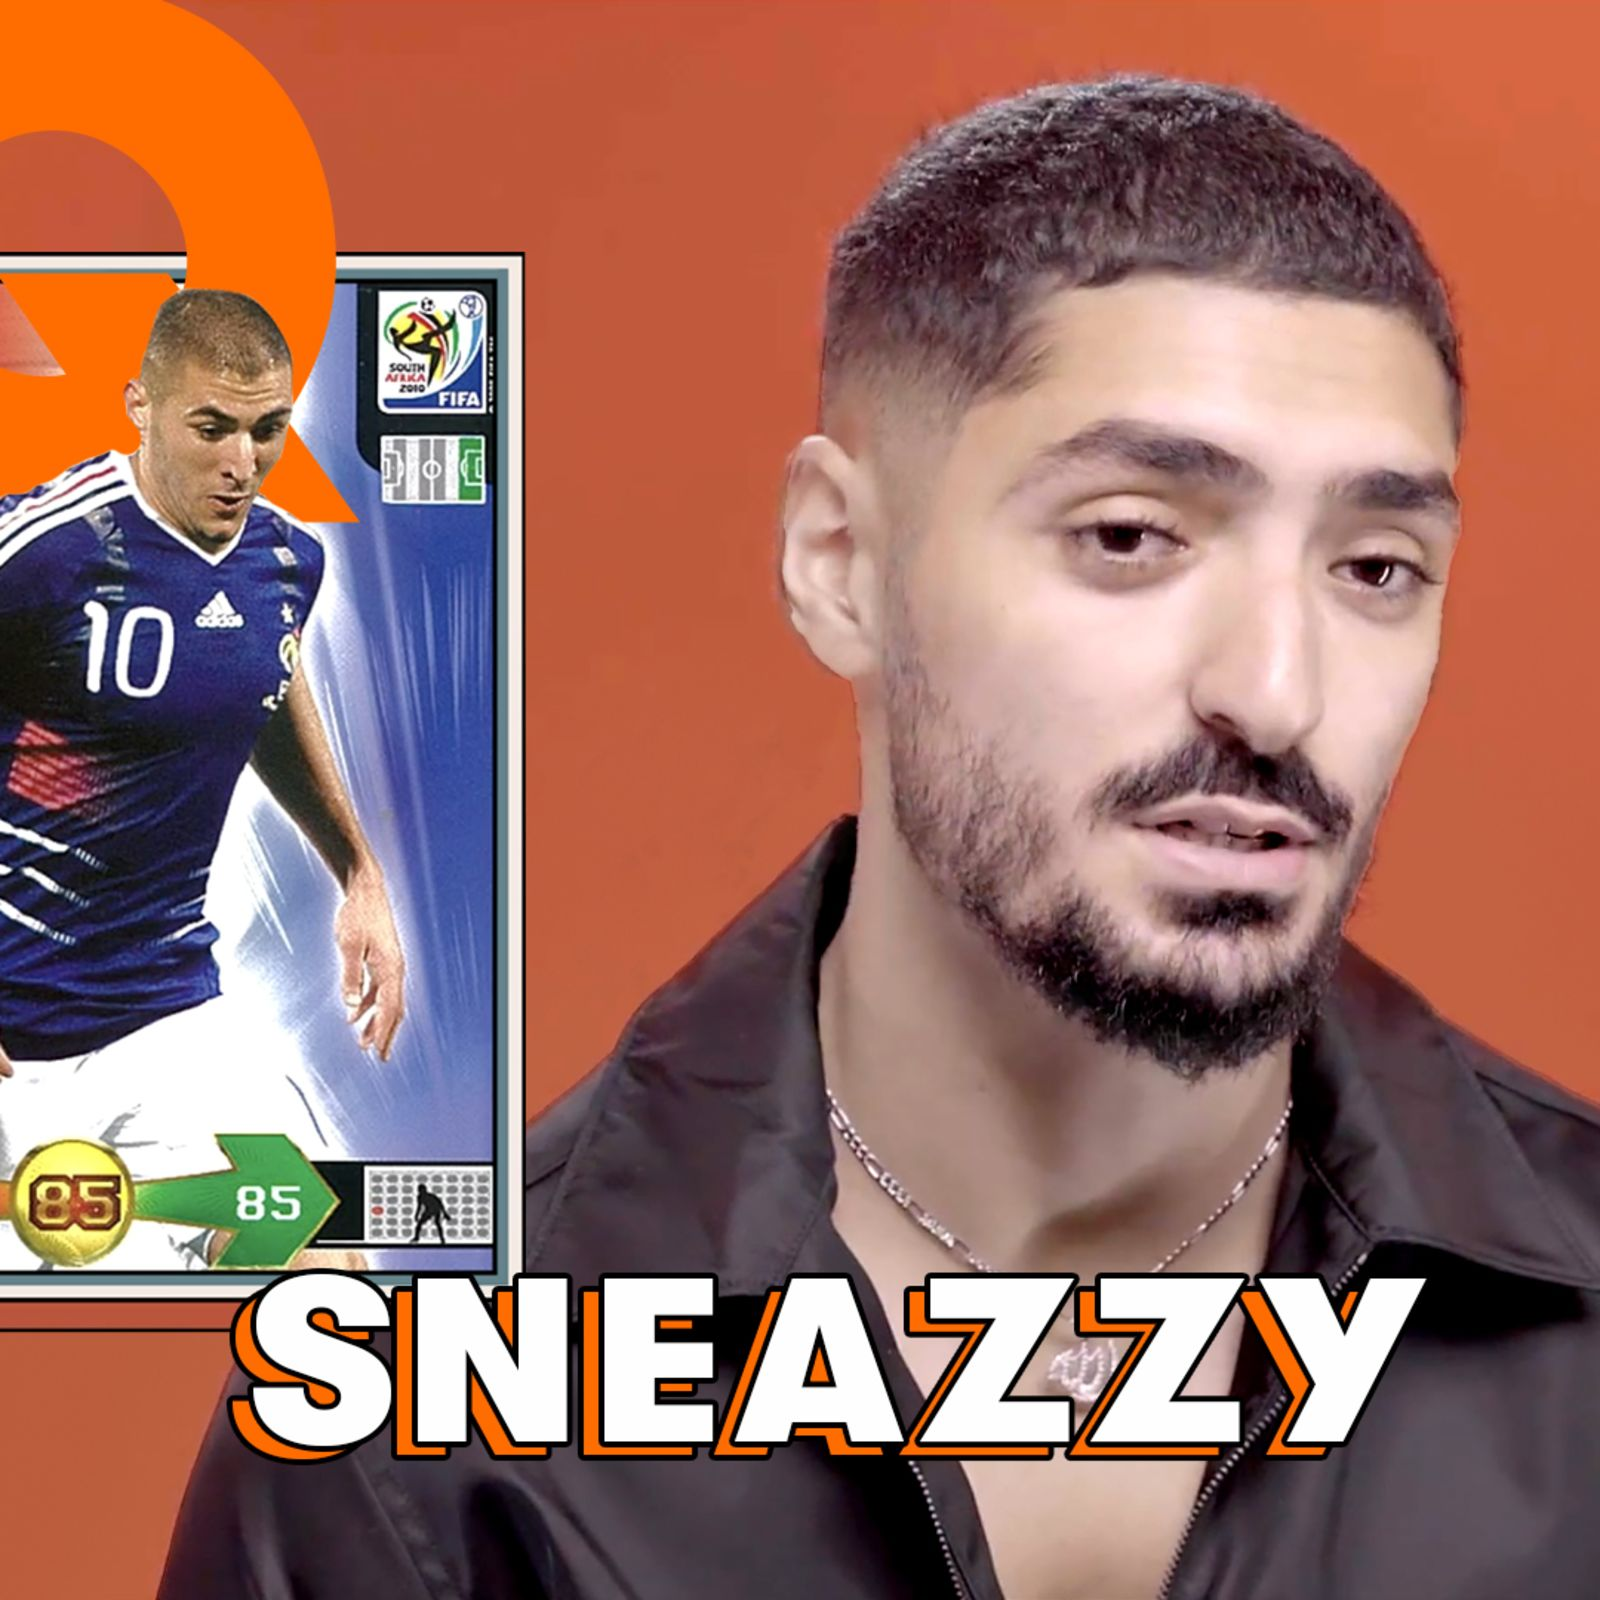 La Tier List football de Sneazzy : Verratti, Rabiot, Ben Arfa